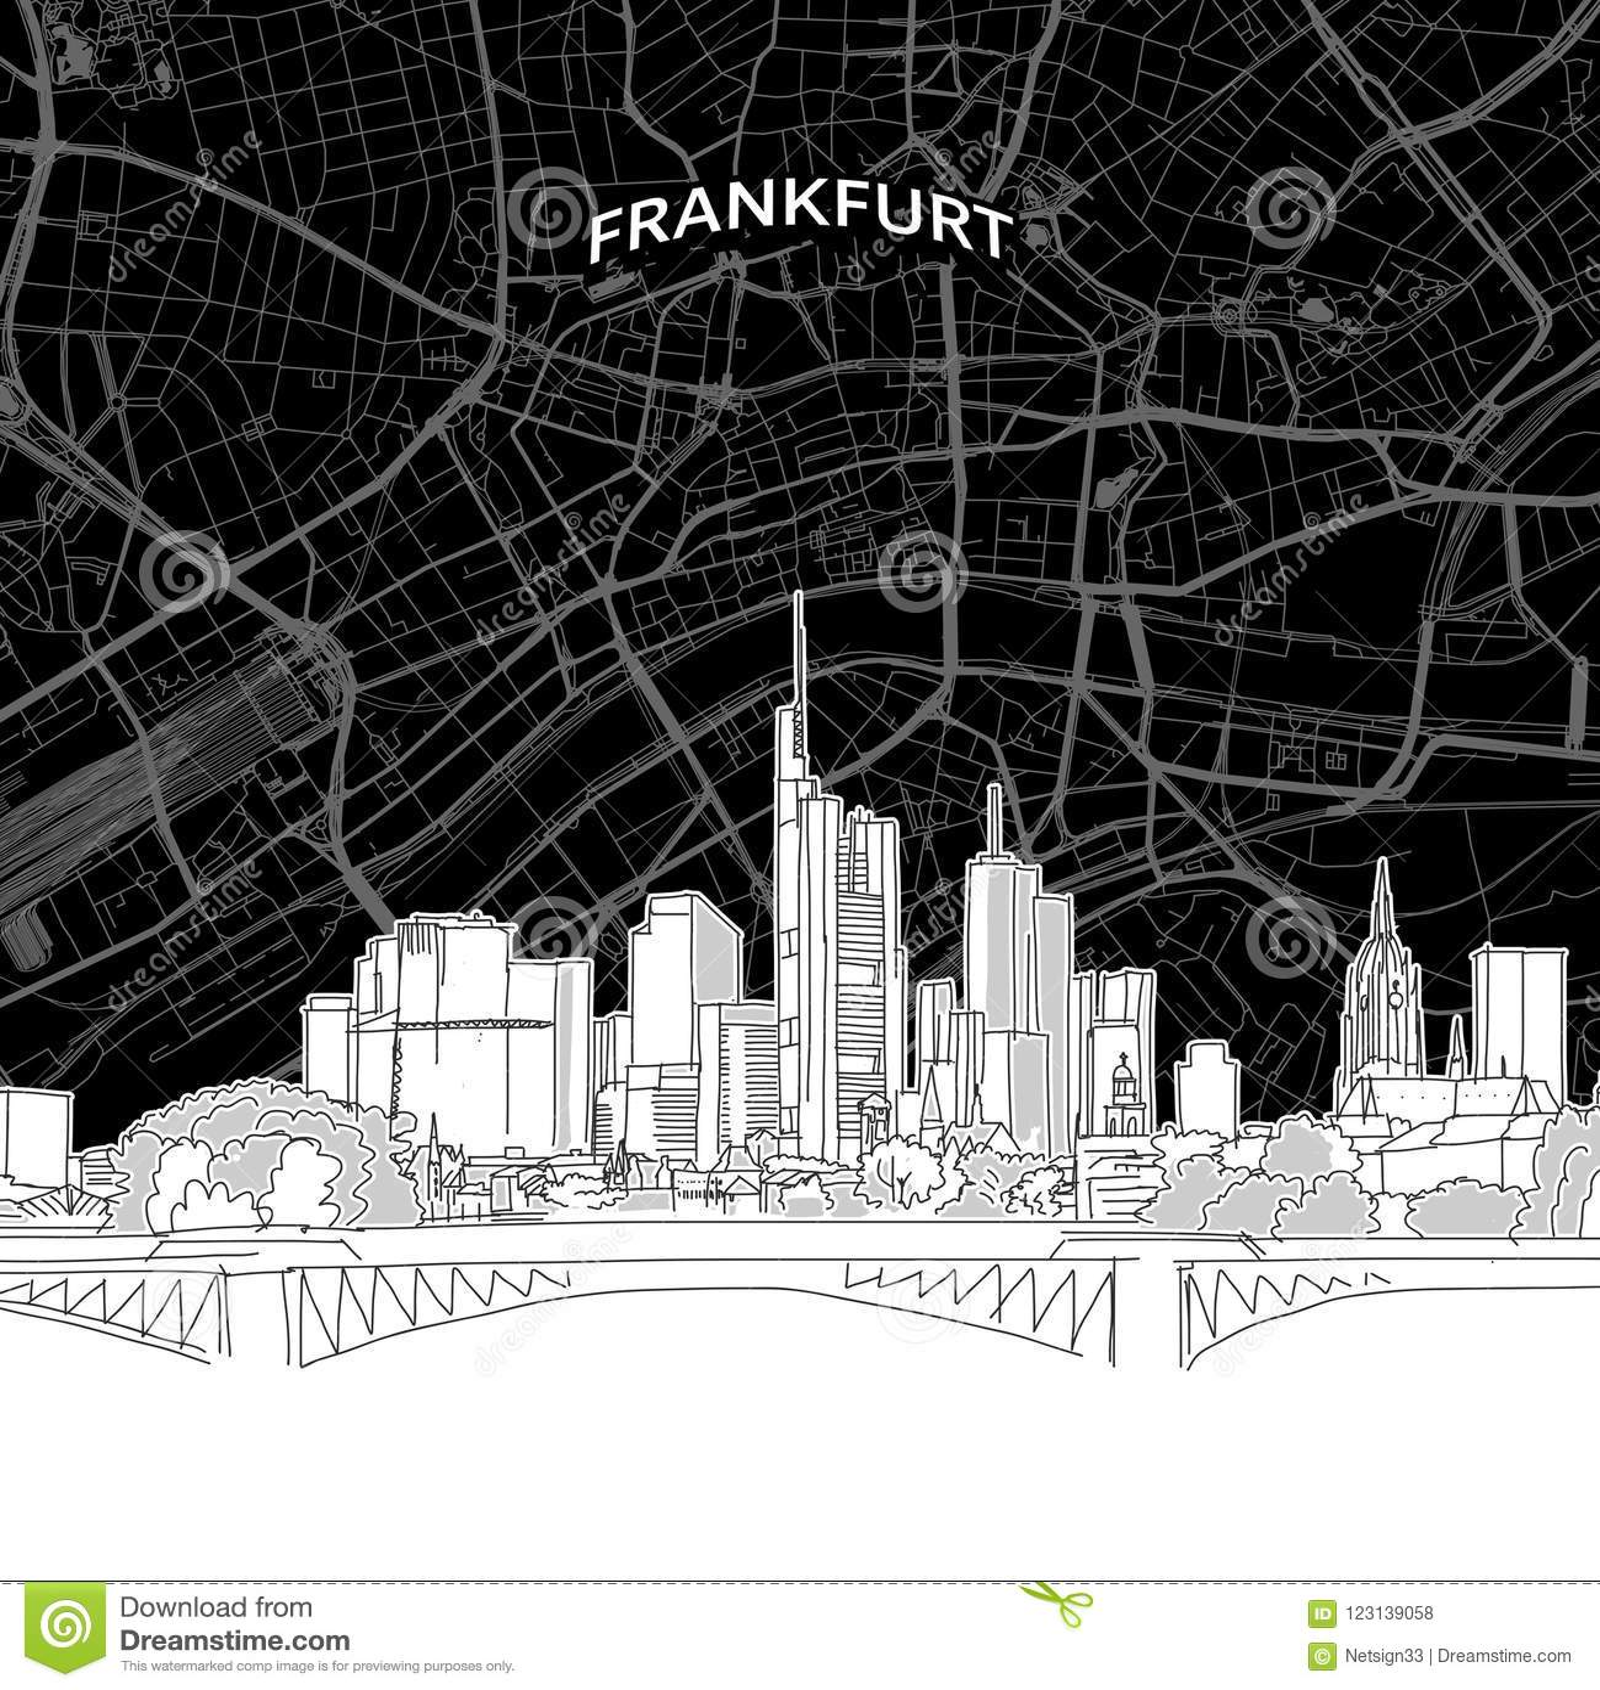 Frankfurt skyline with map